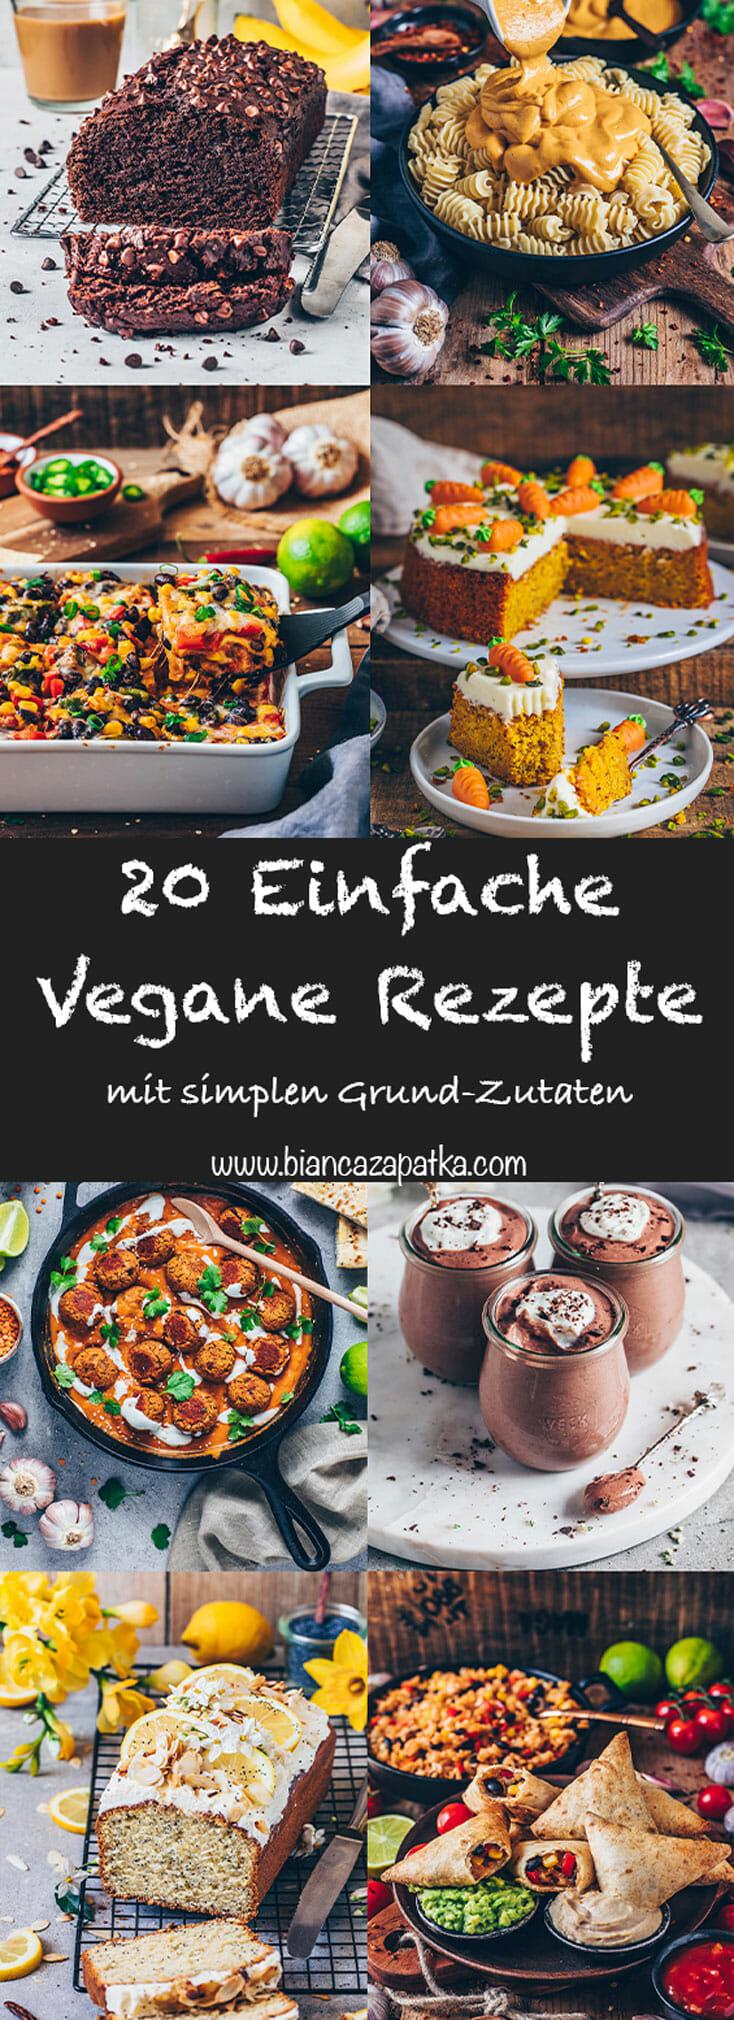 Einfache Vegane Rezepte